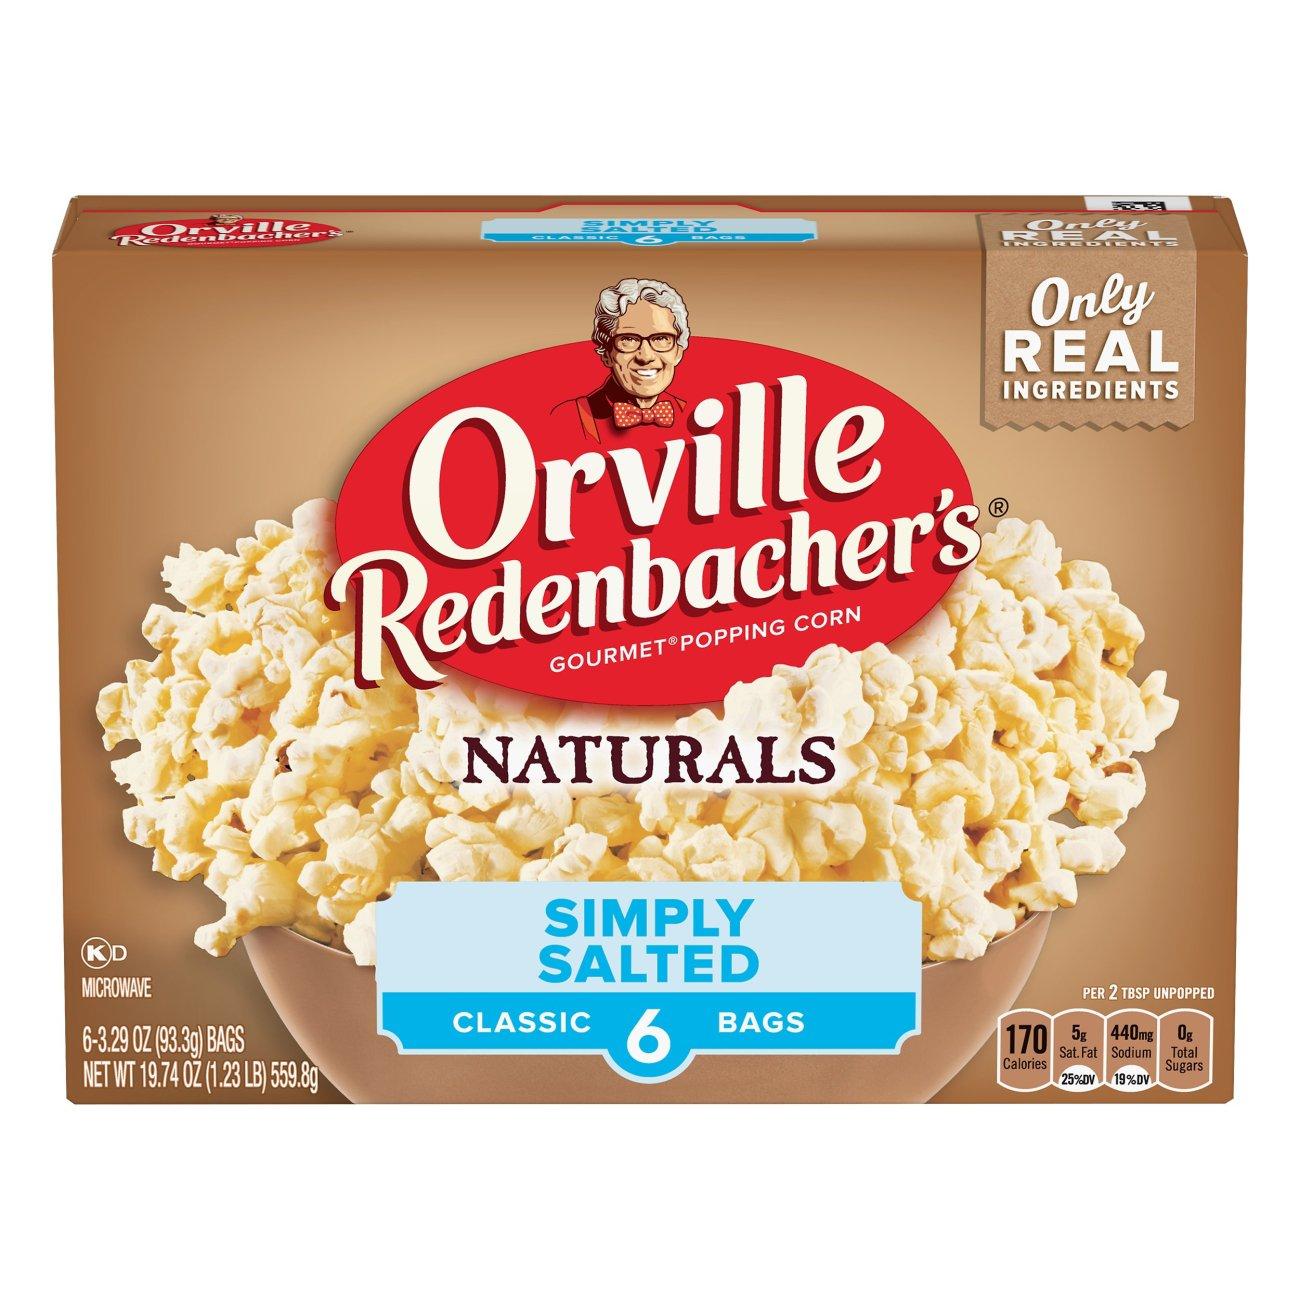 Orville Redenbacher's Naturals Simply